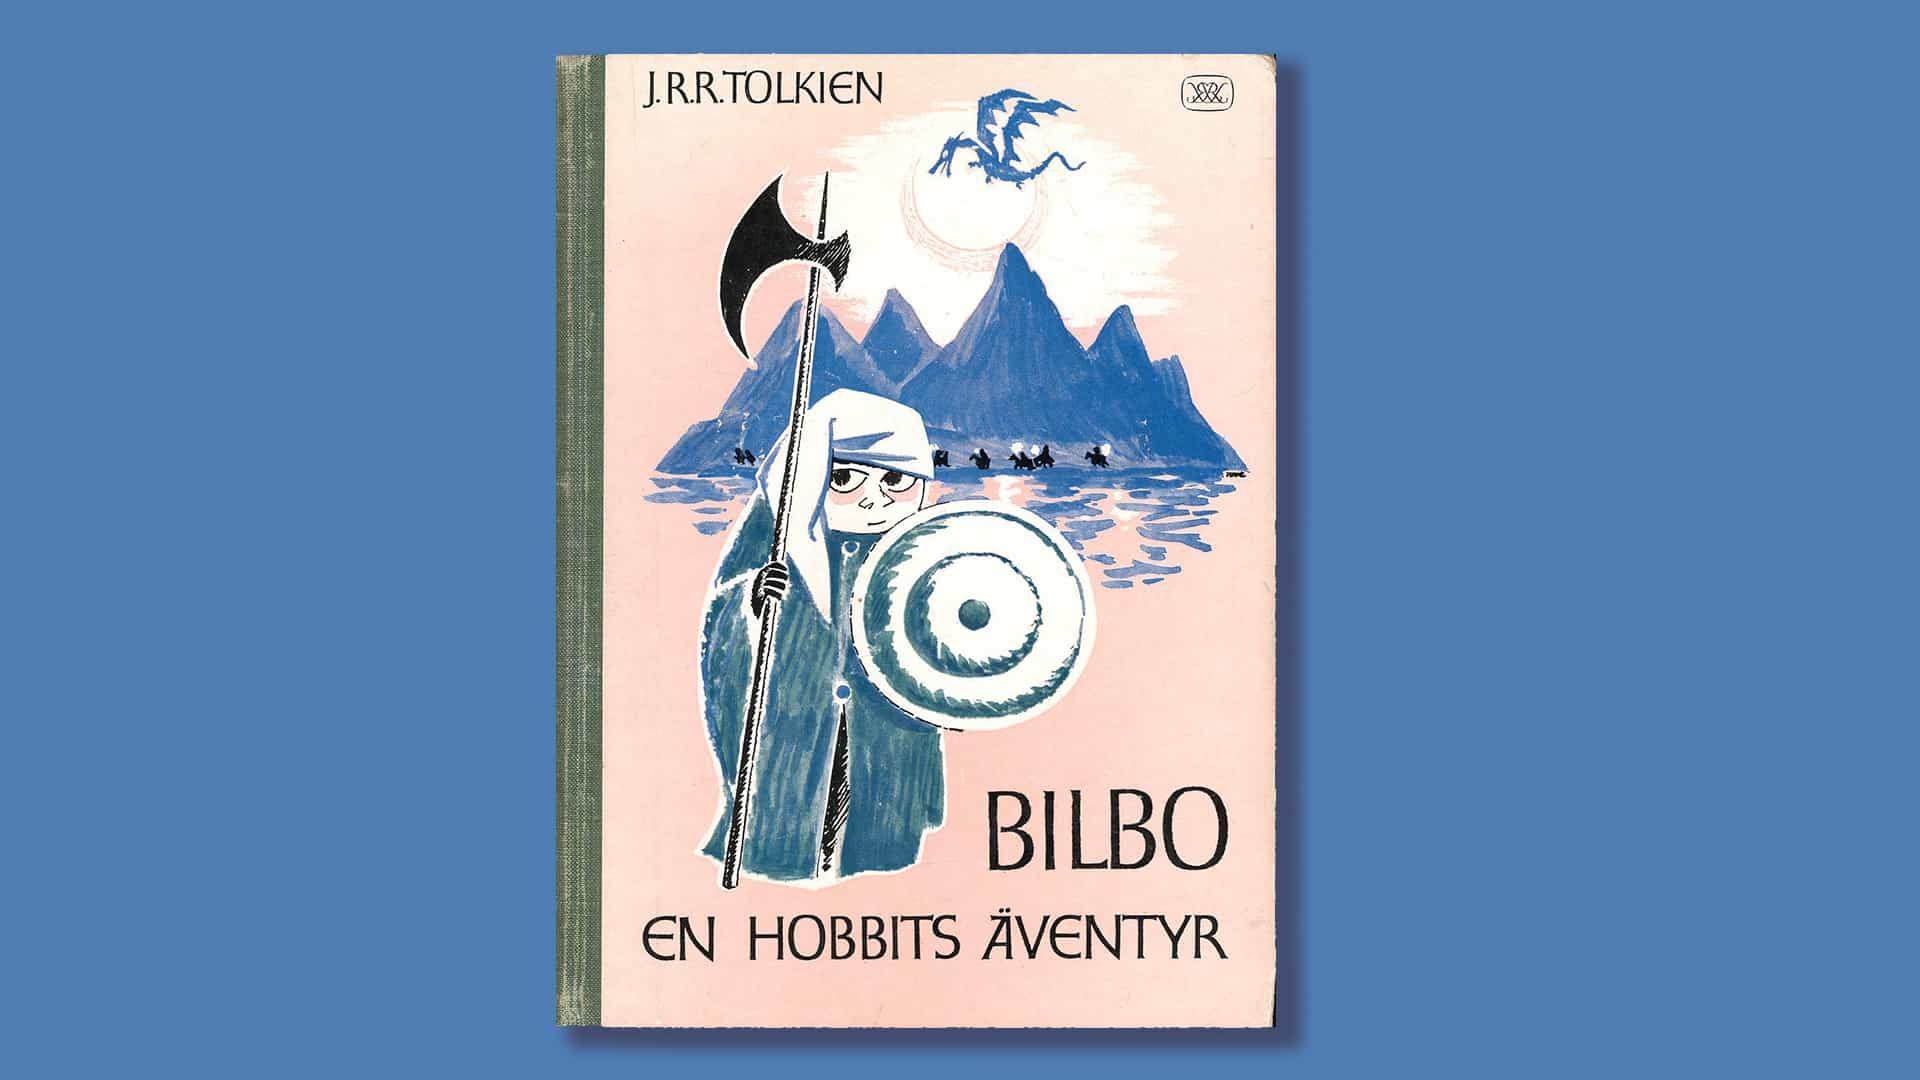 Artista de Moomin se enfrenta a El Hobbit de Tolkien